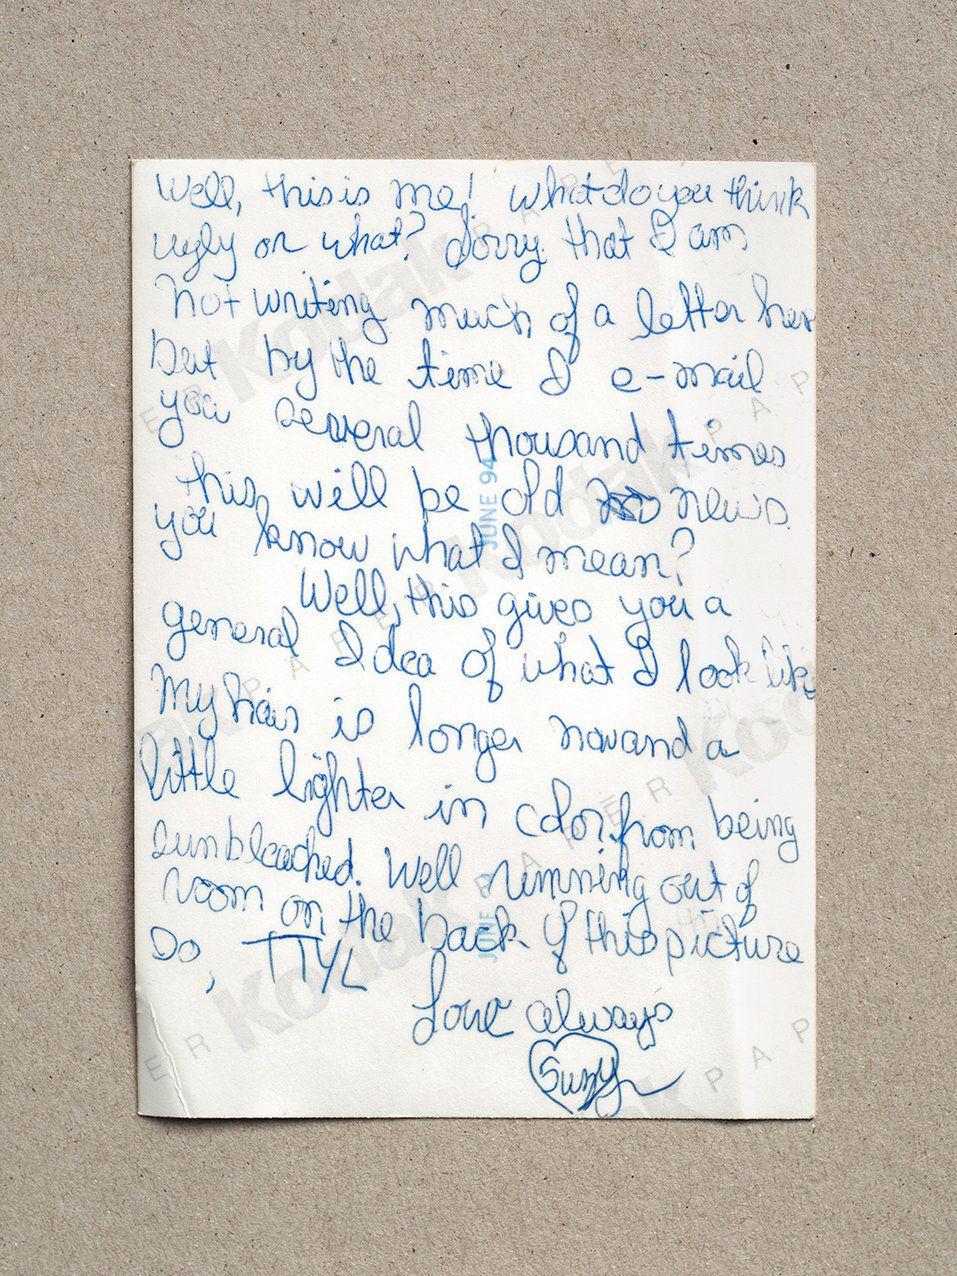 Suzanne's handwriting